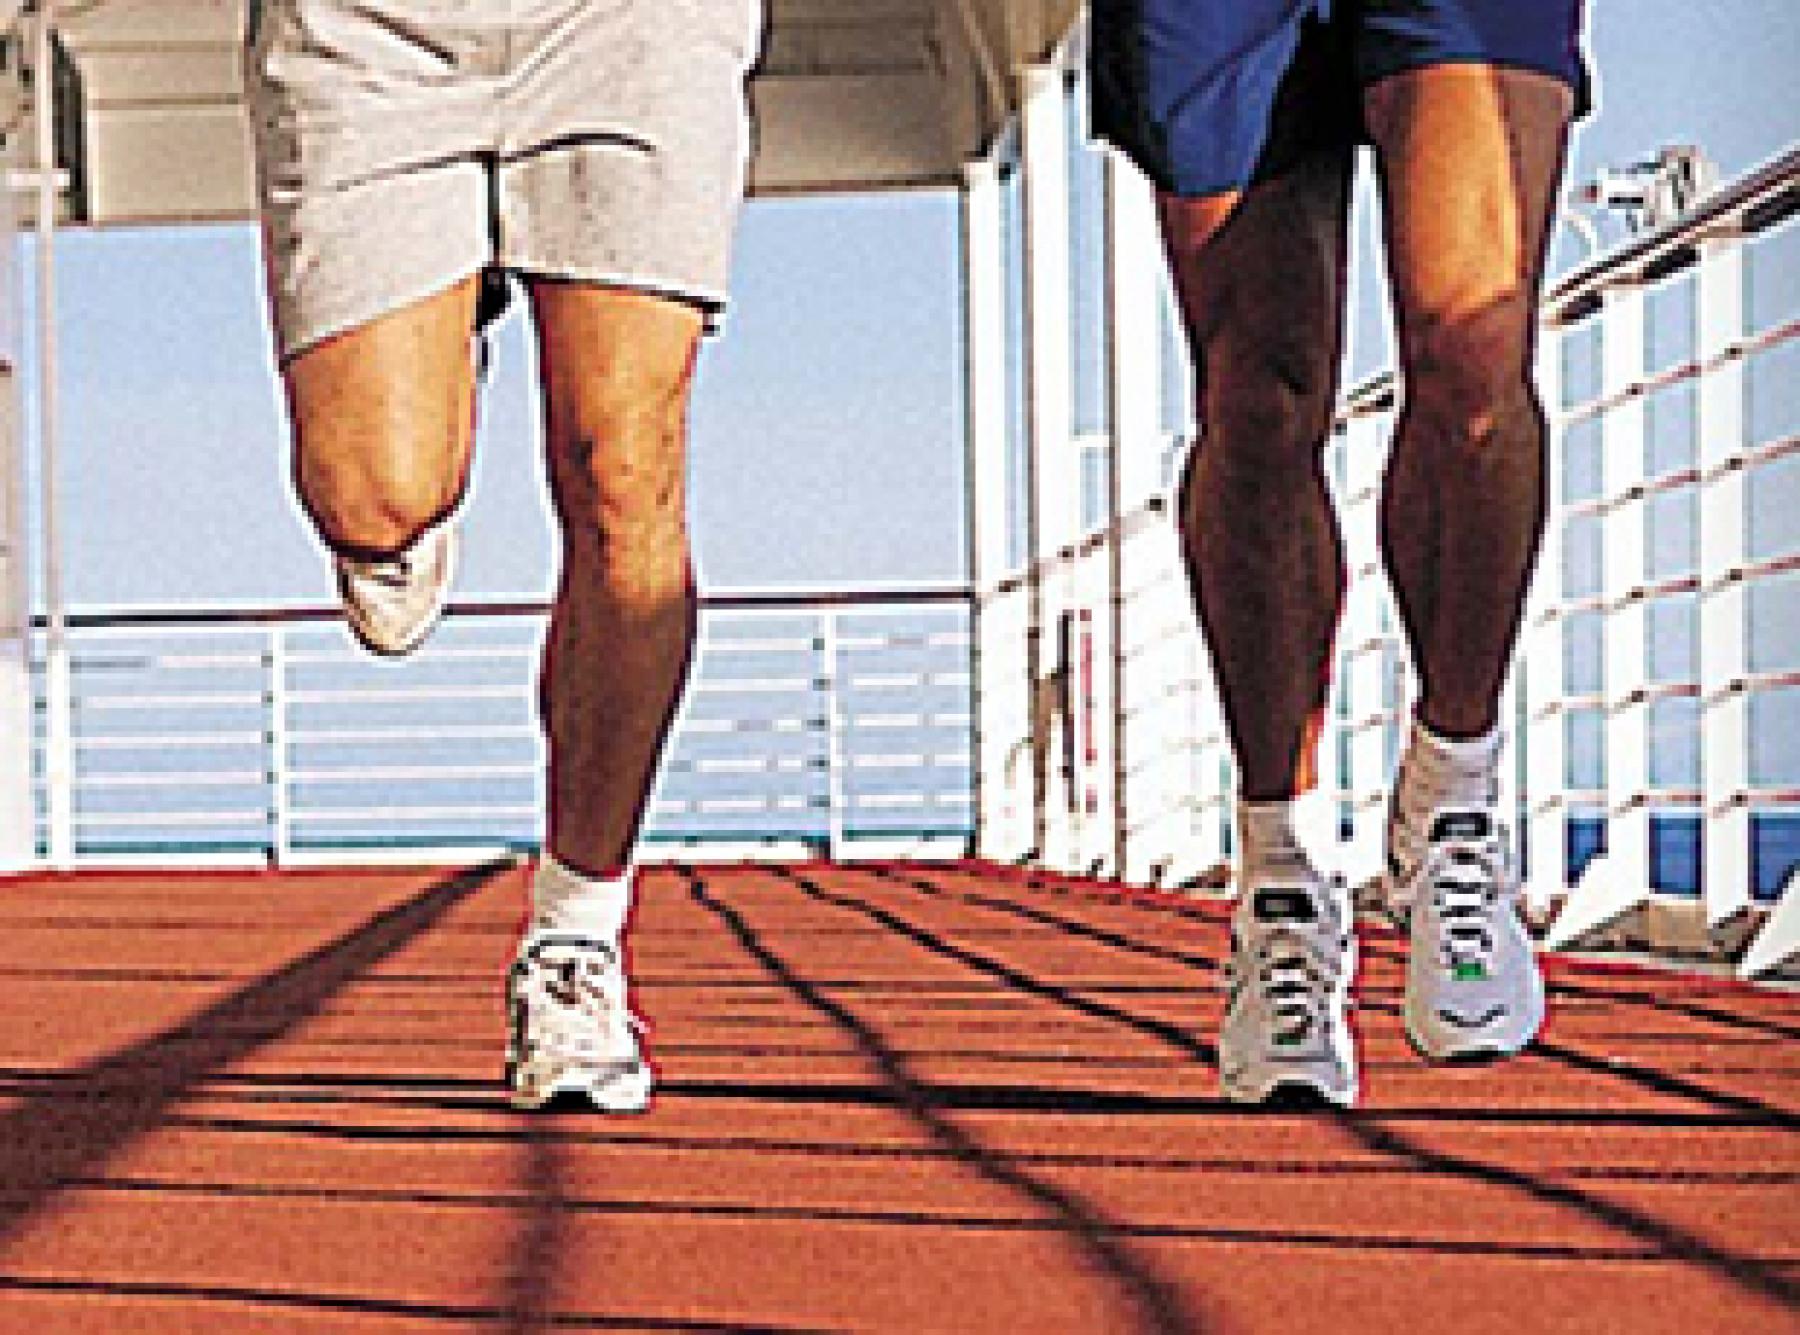 Norwegian Cruise Line Norwegian Sky Exterior Joggin:Walking Track.jpg